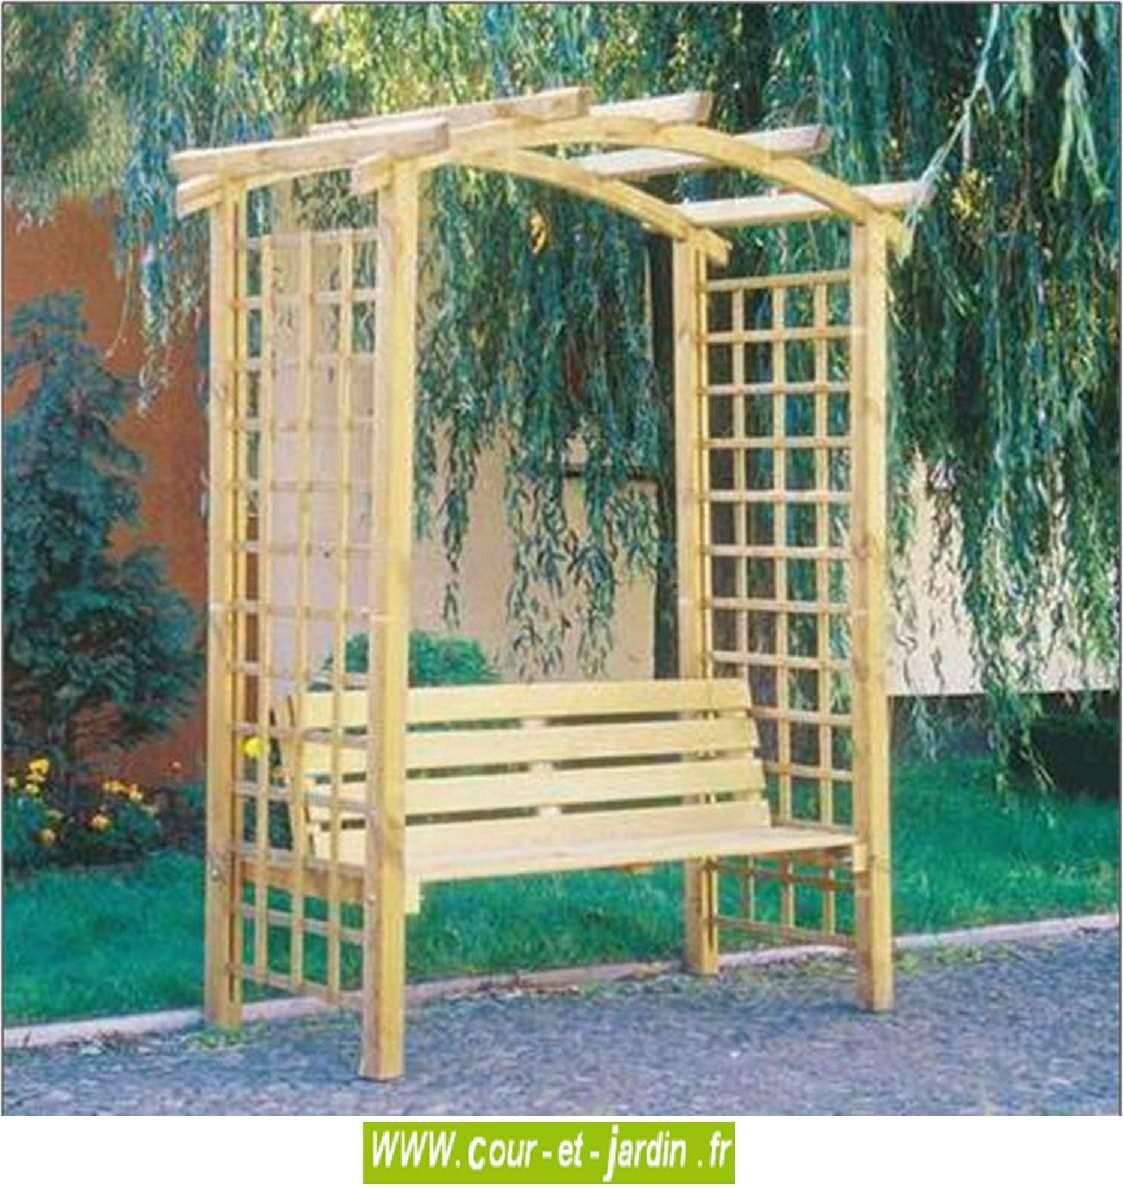 Pergola De Jardin Arcade Avec Banc. Arche Jardin Bois ... avec Arche Bois Jardin